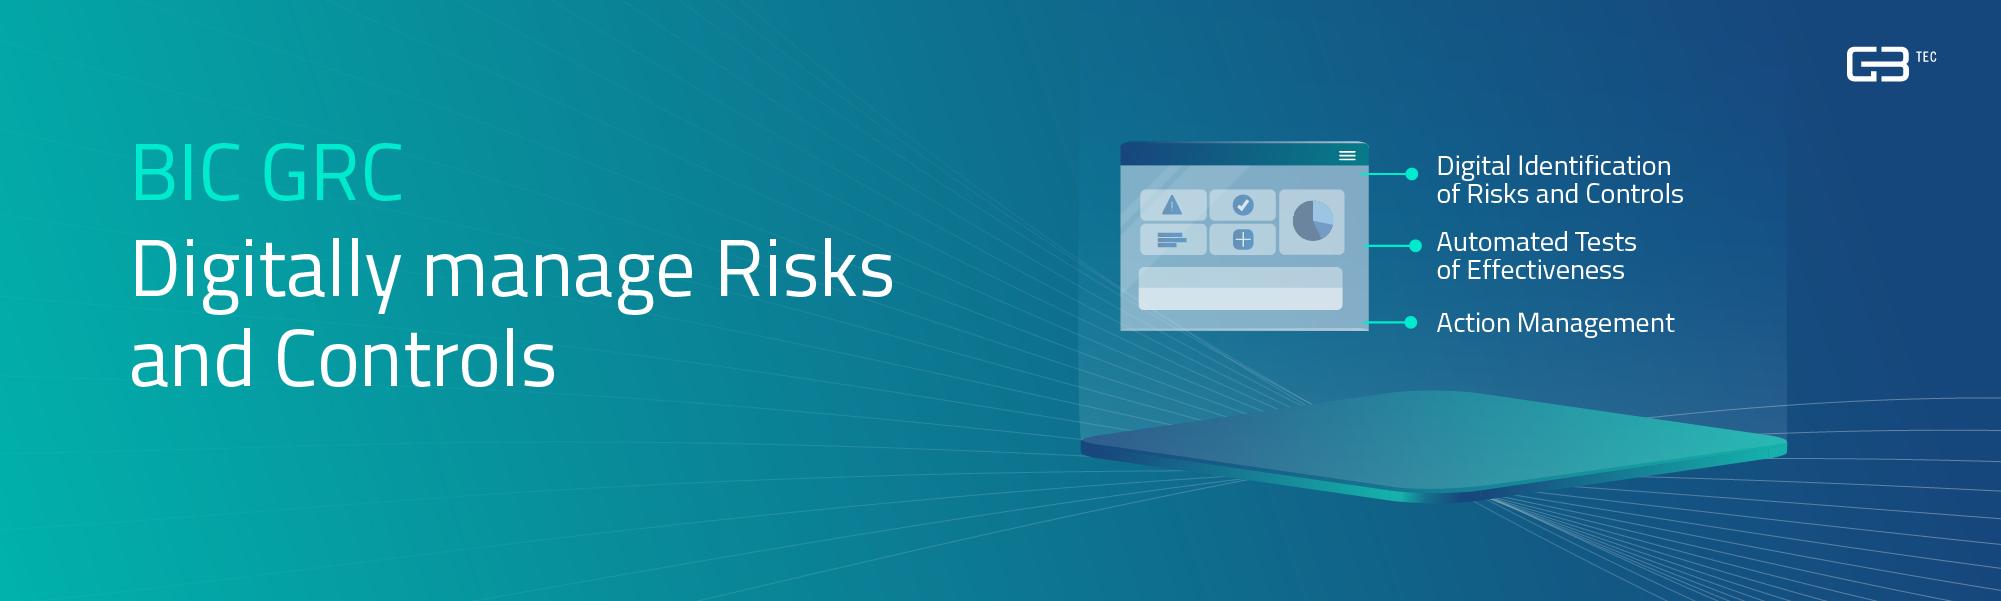 Review BIC GRC: GRC software for responsible risk management - appvizer